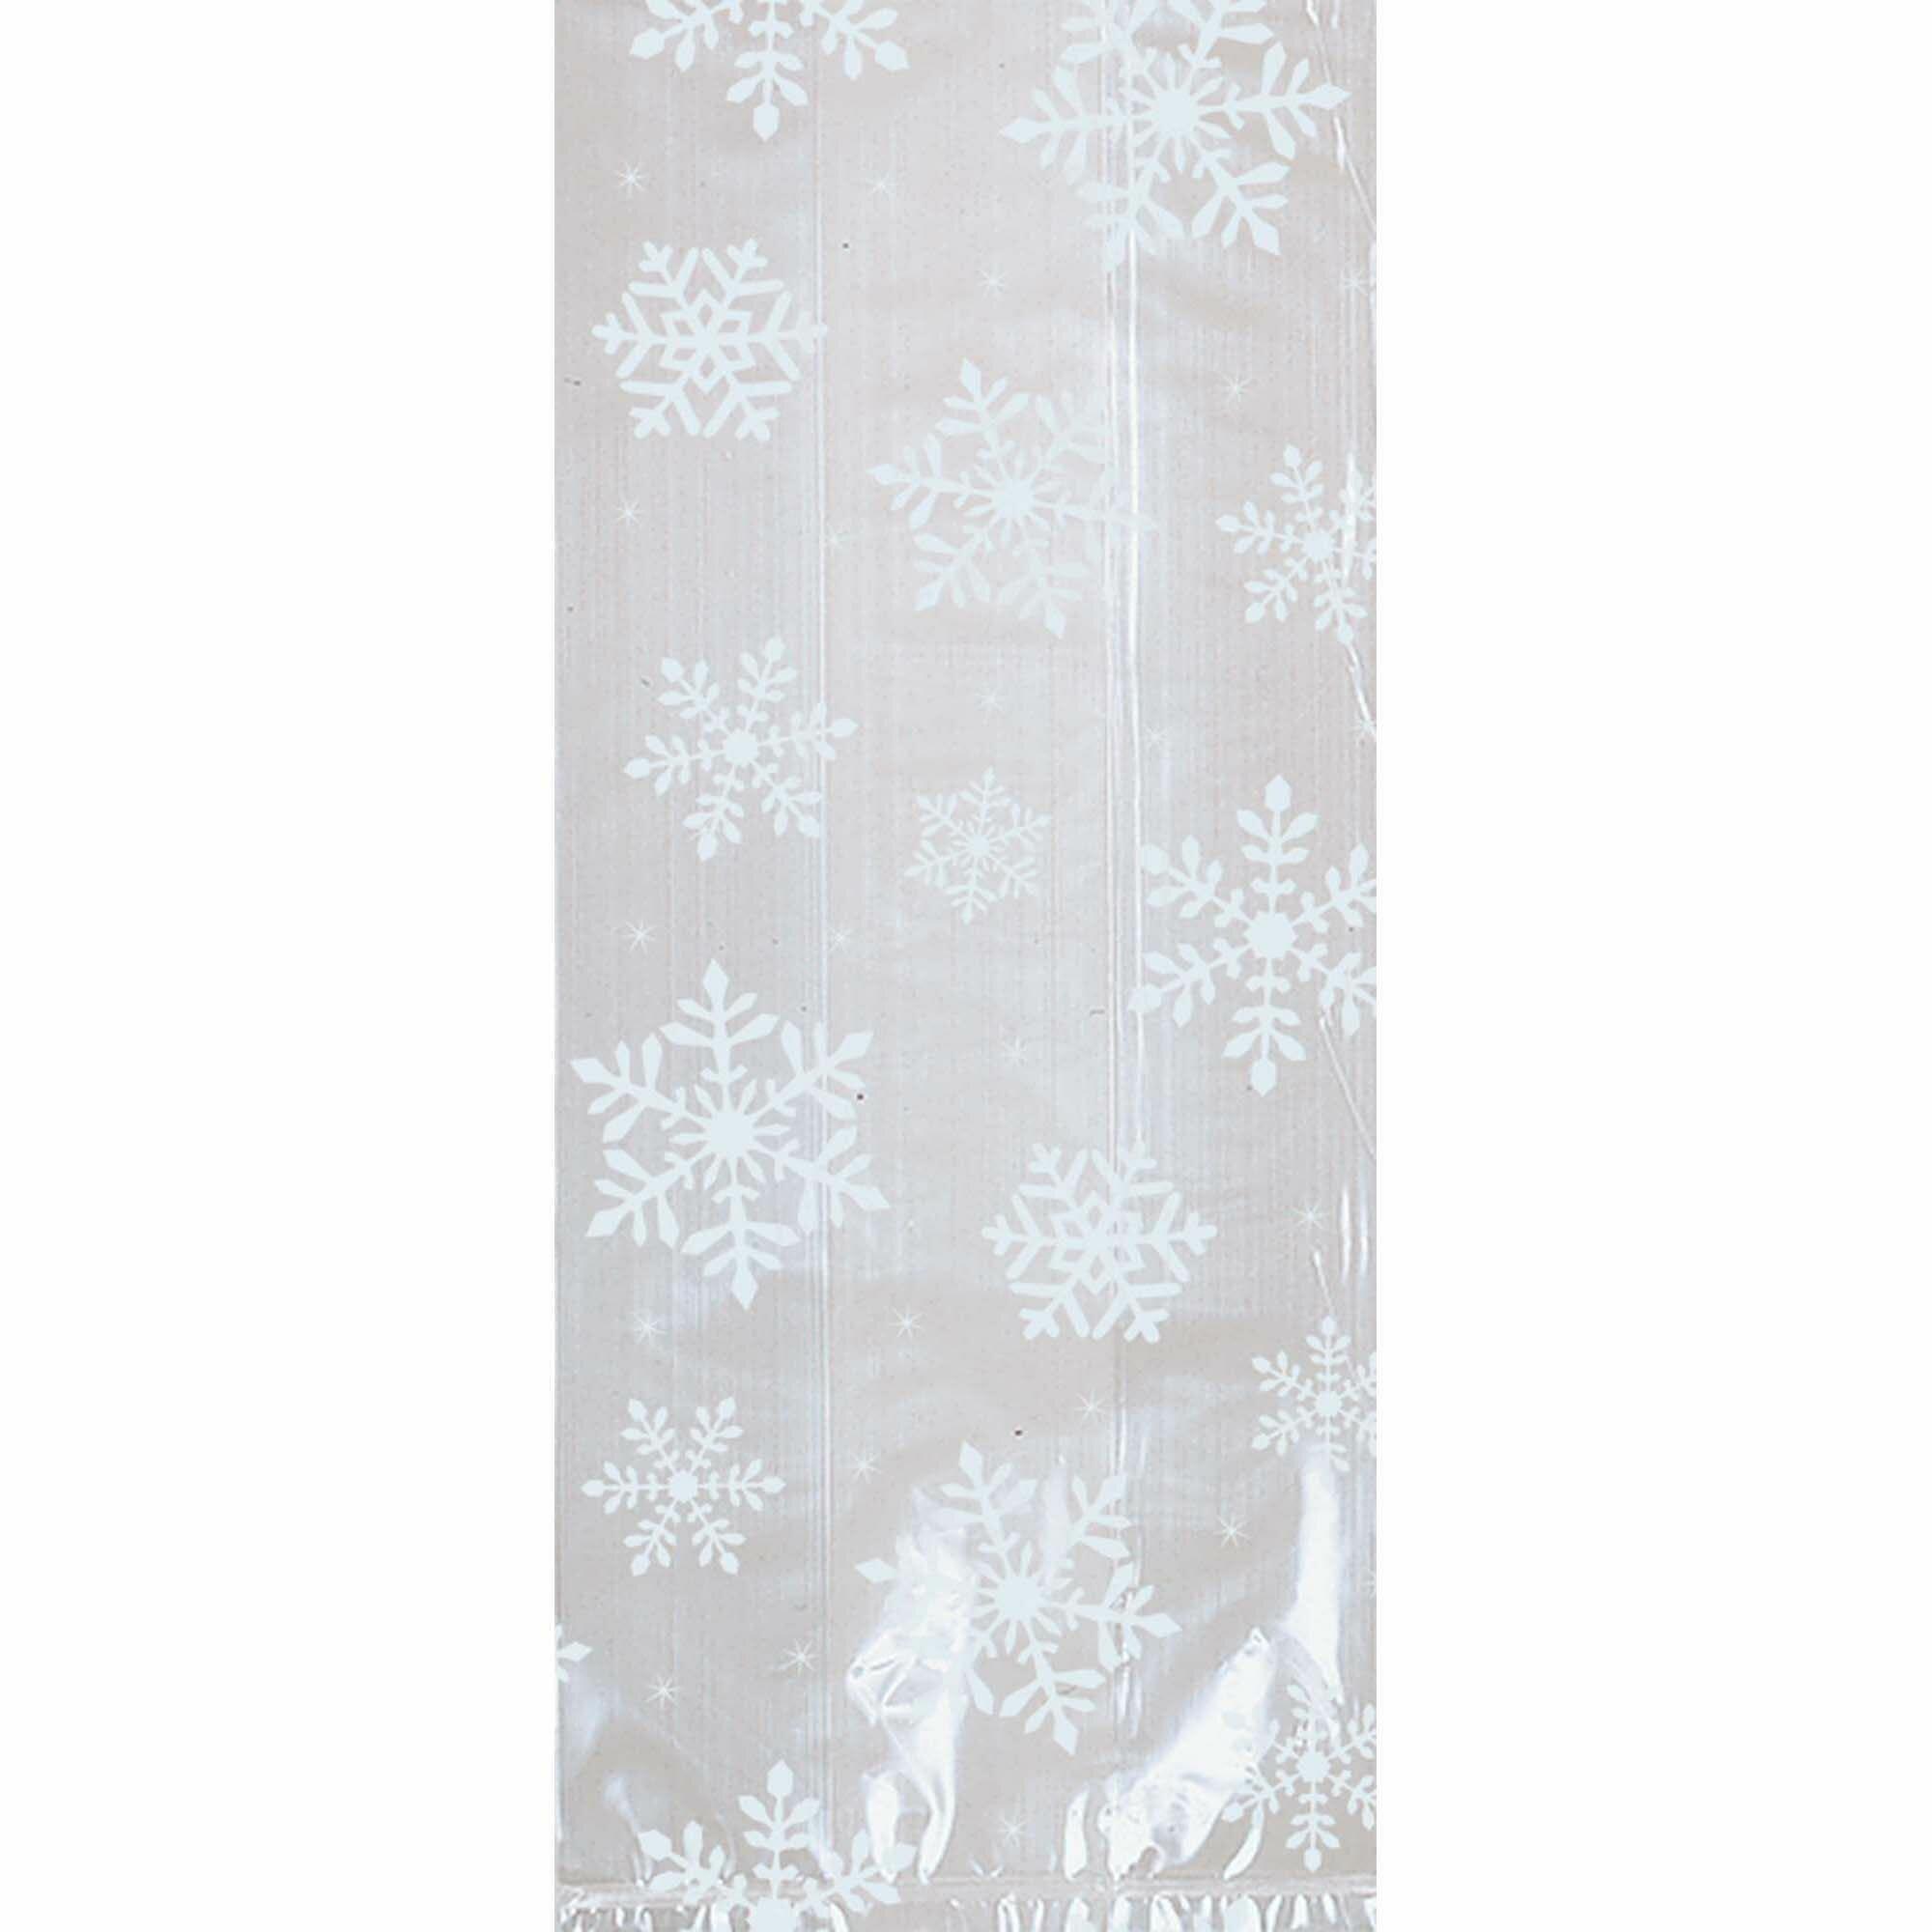 Christmas White Snowflake Large Cellophane Party Bag